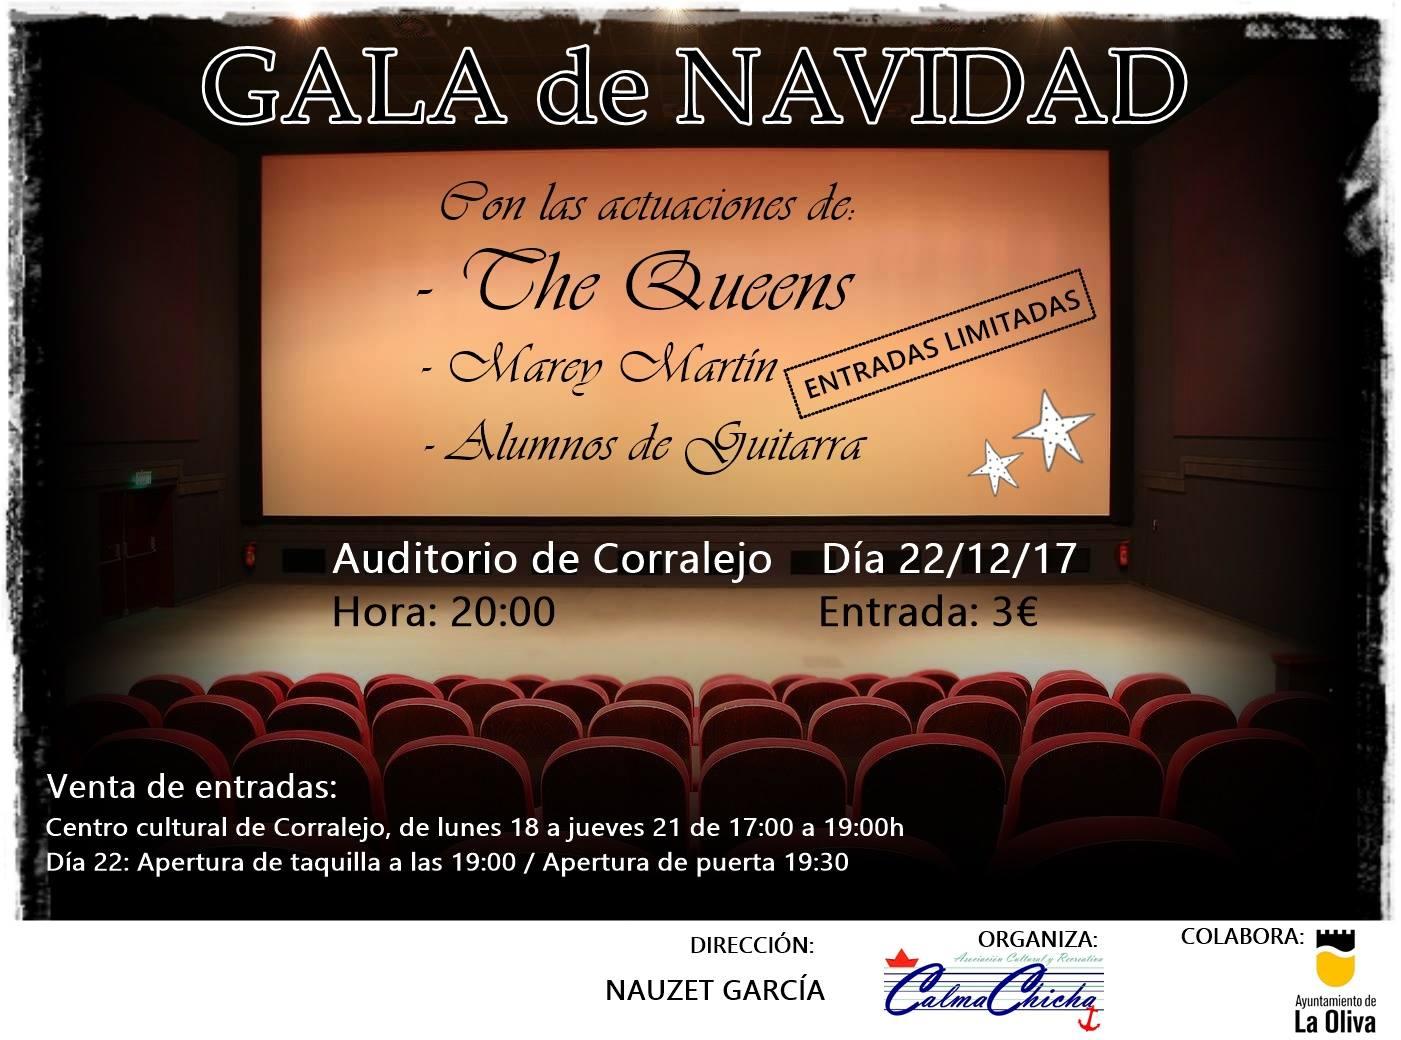 gala-navidad-corralejo-2017